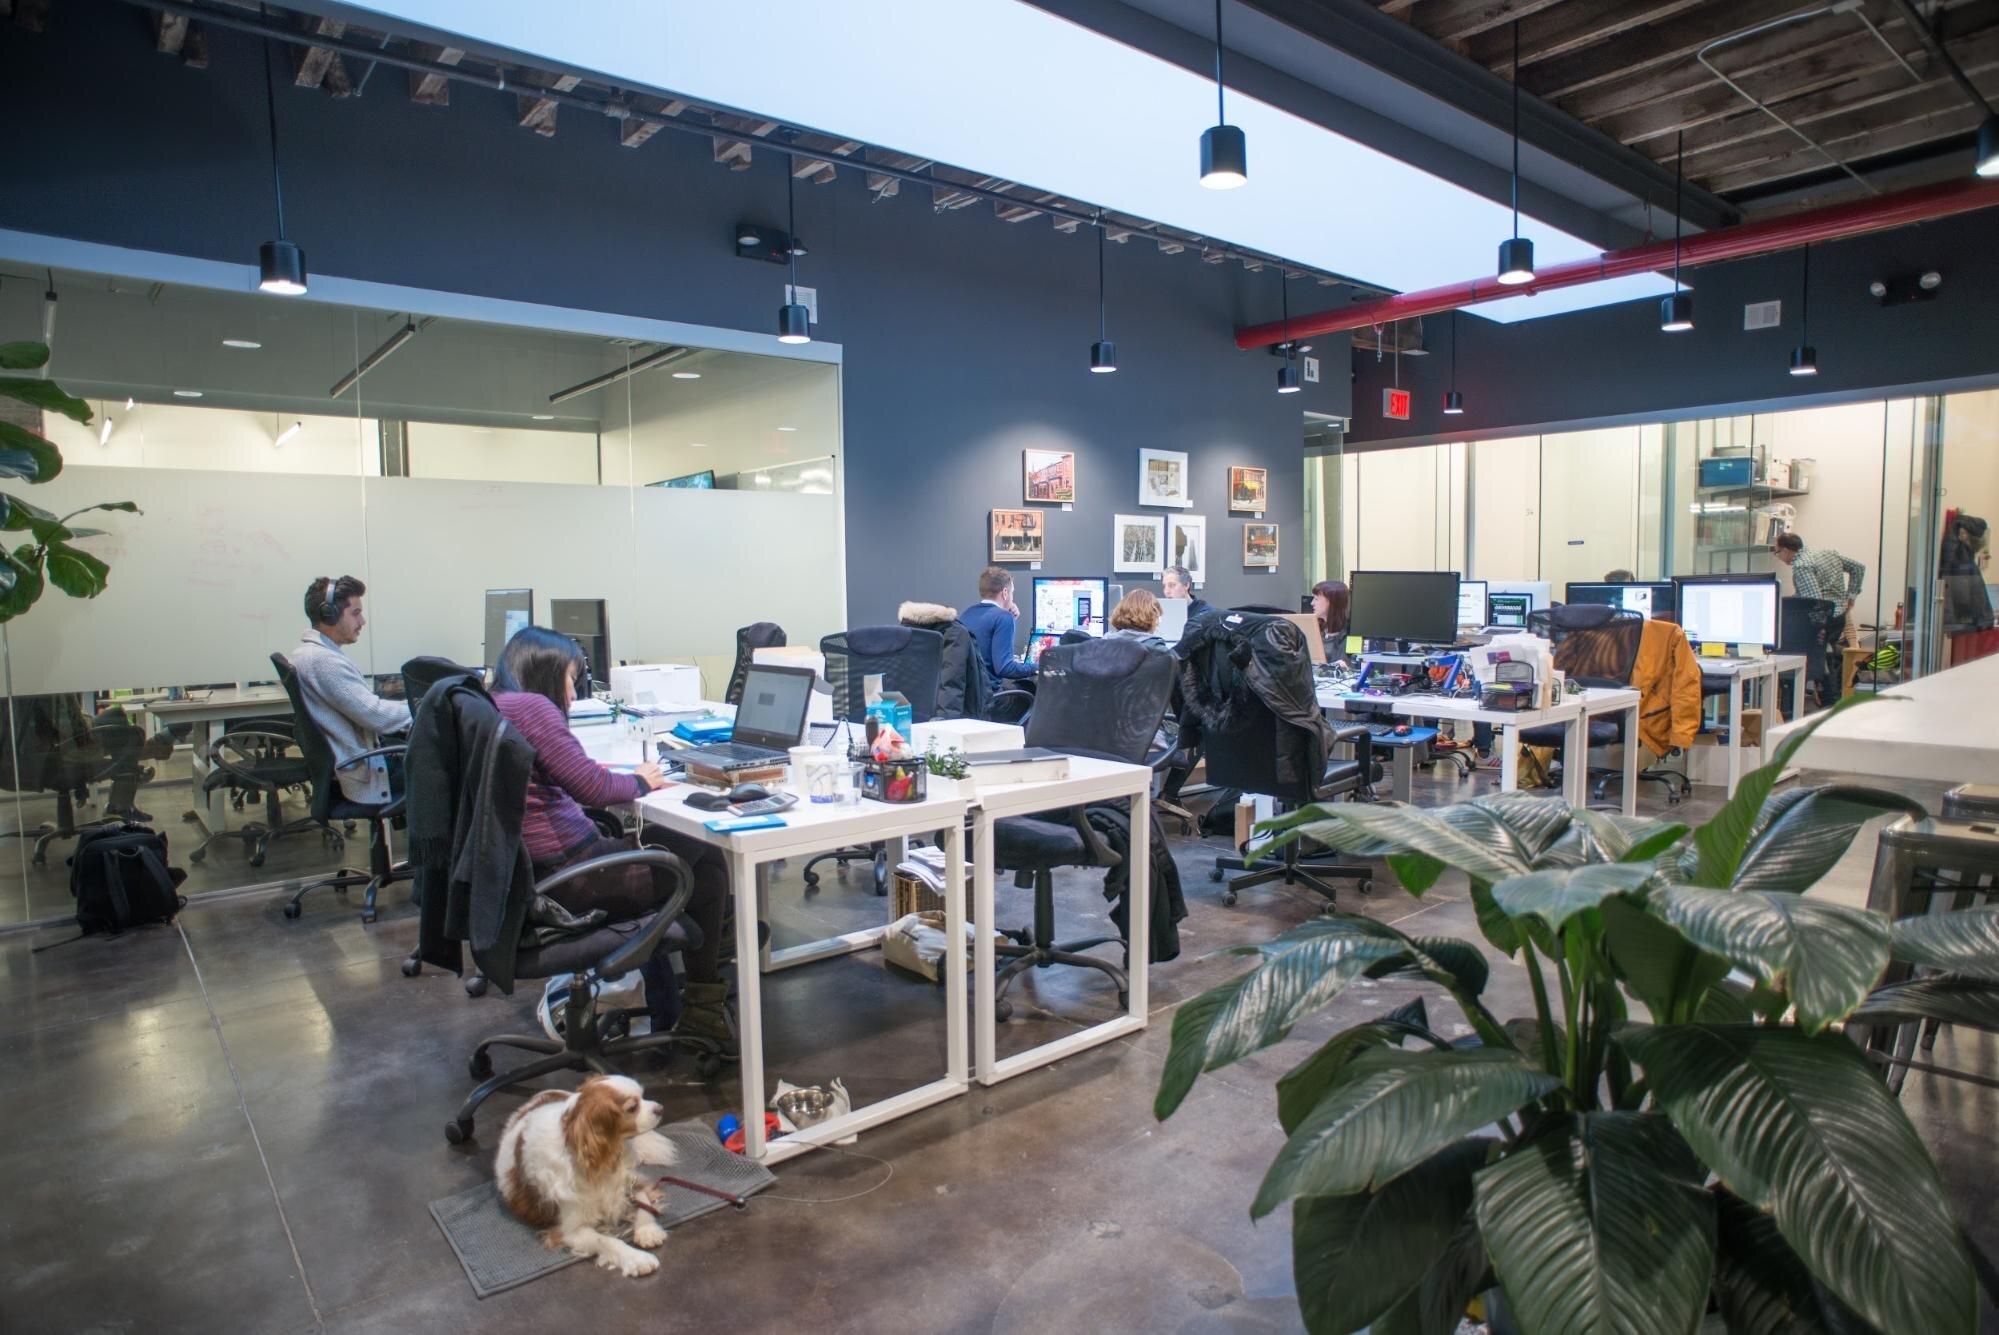 workers utilizing hot desking